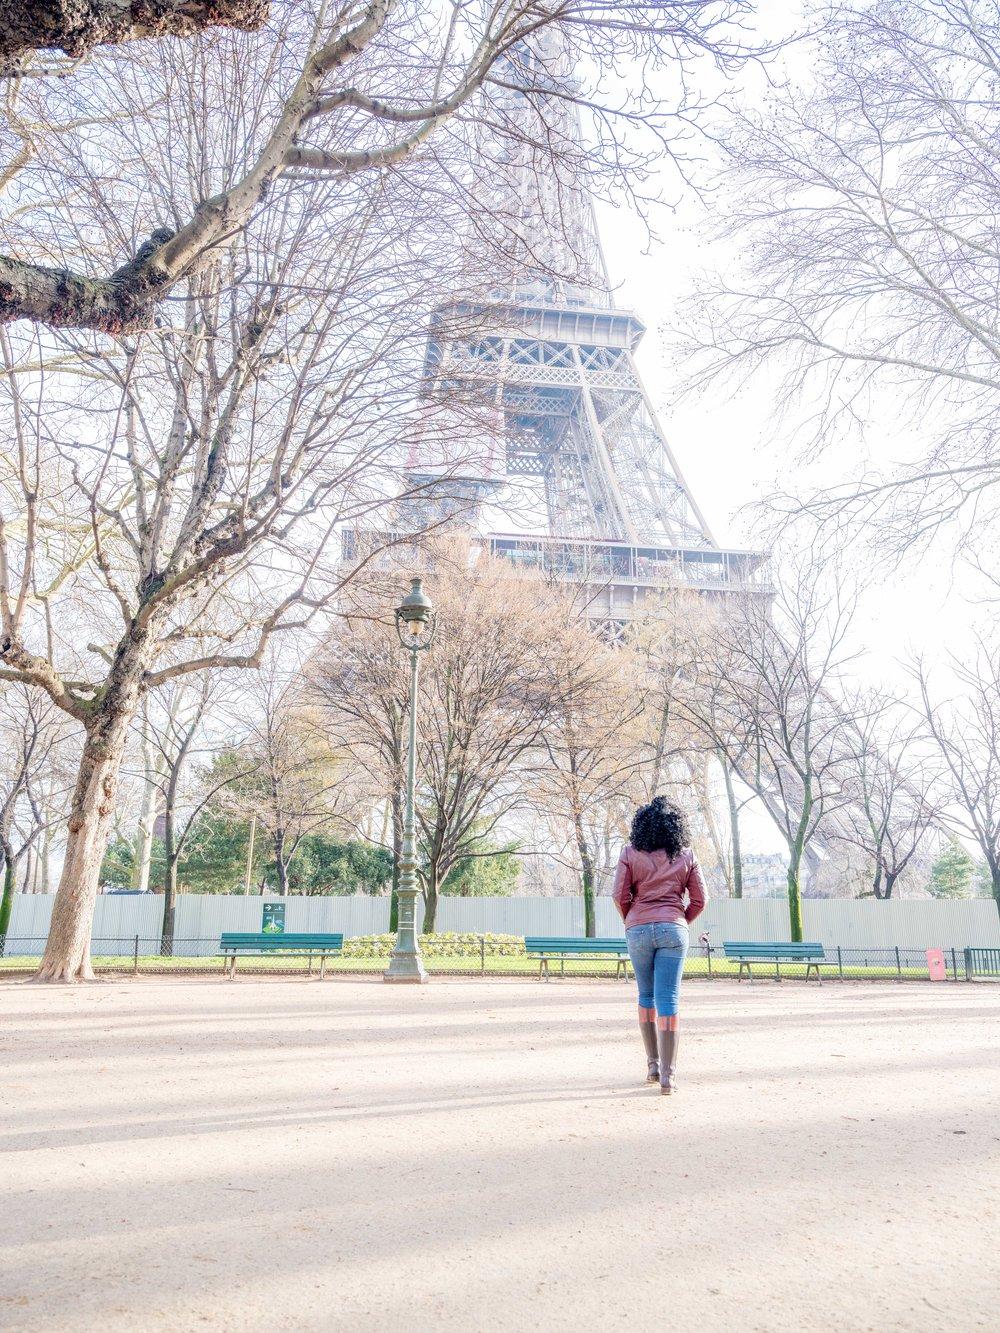 solo female traveler photo session at eiffel tower paris france